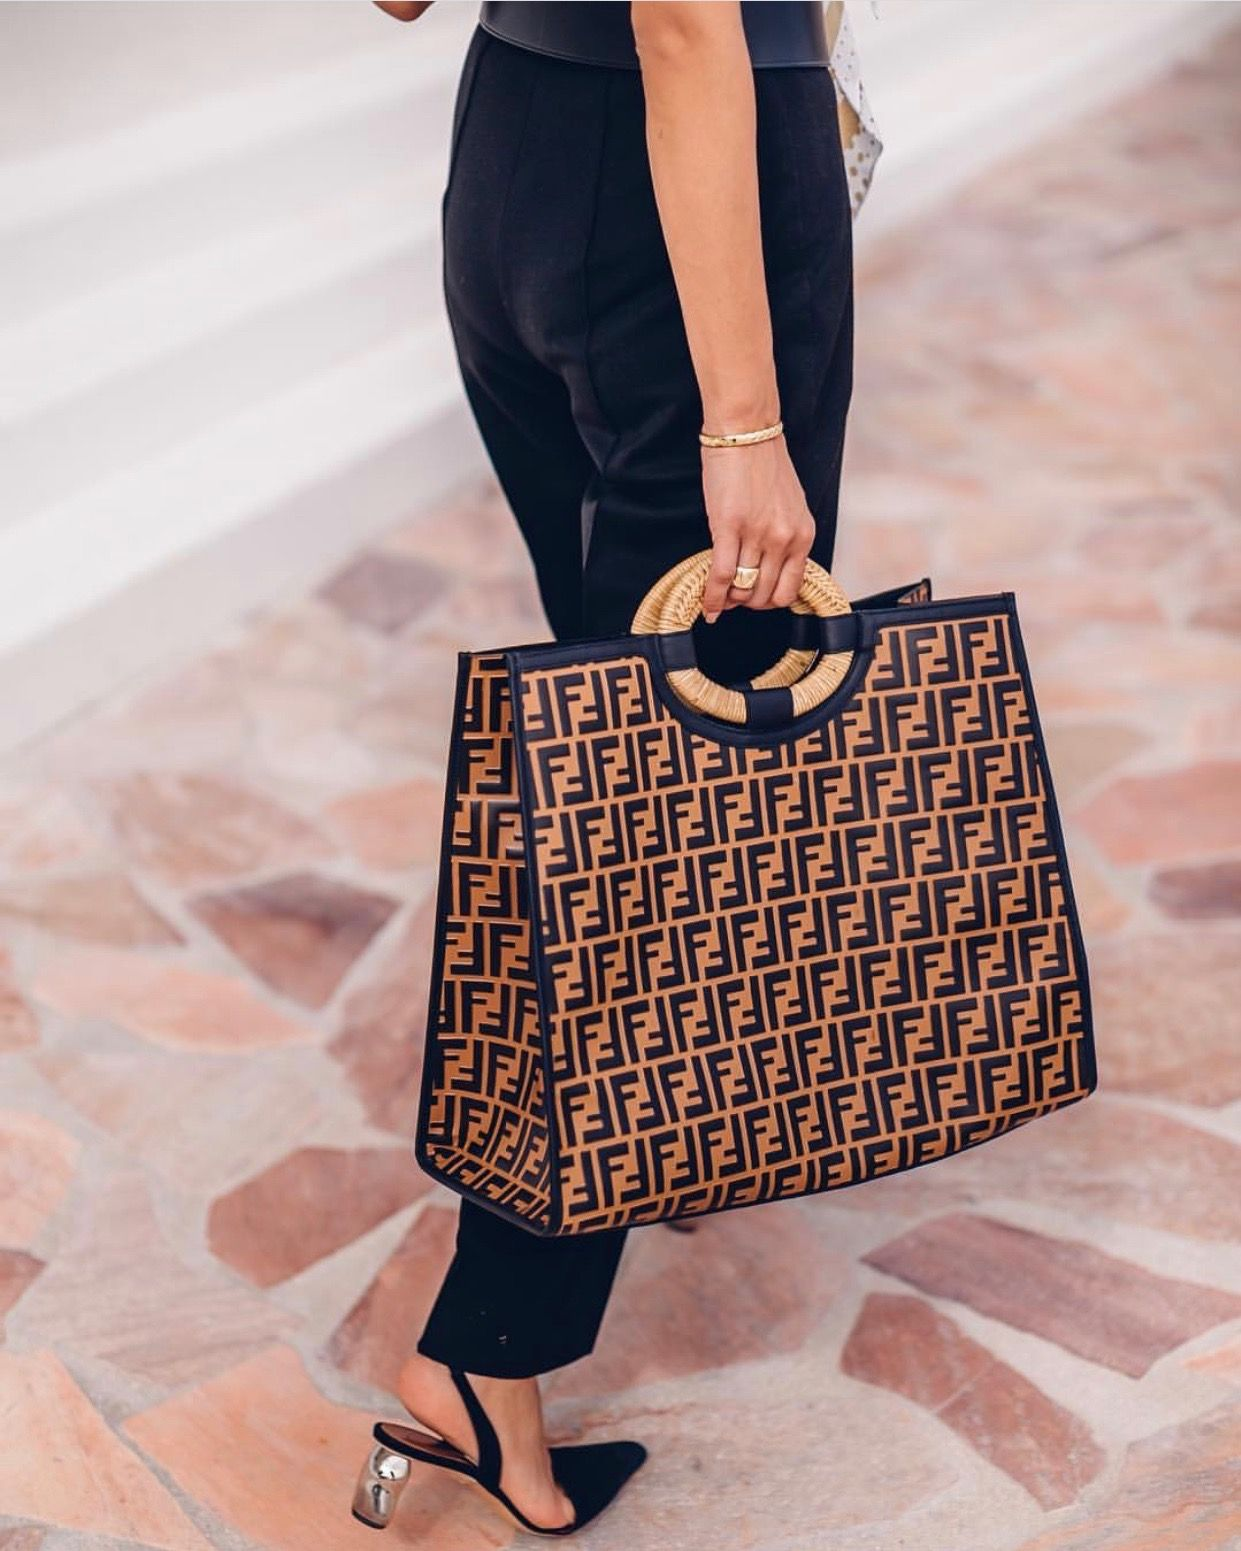 1b351a7b4dff Love this bag Hamptons Fashion